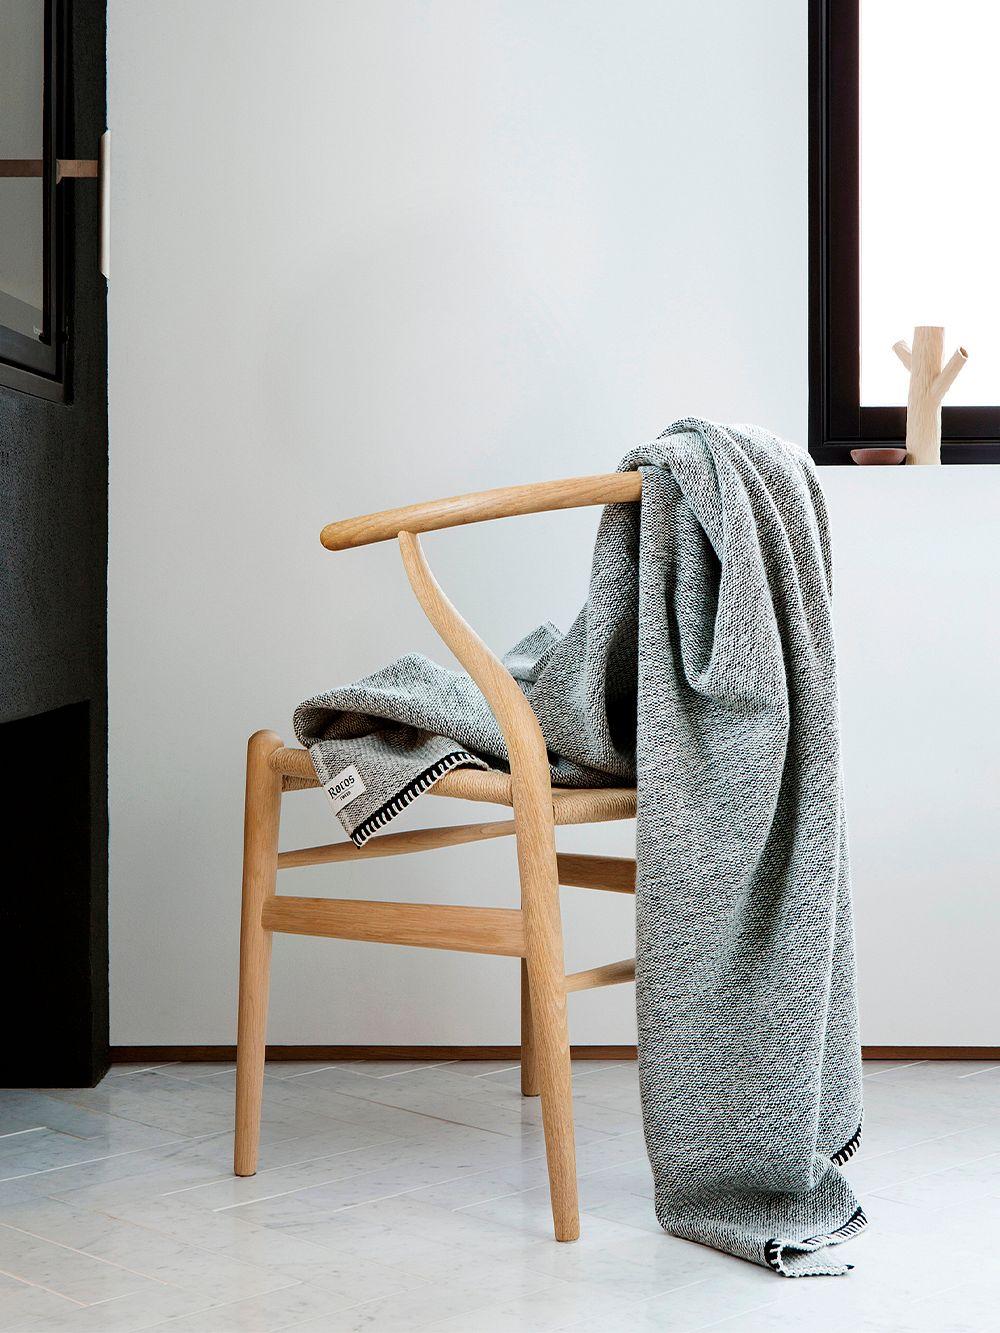 Røros Tweed Picnic throw 200 x 150 cm, natural